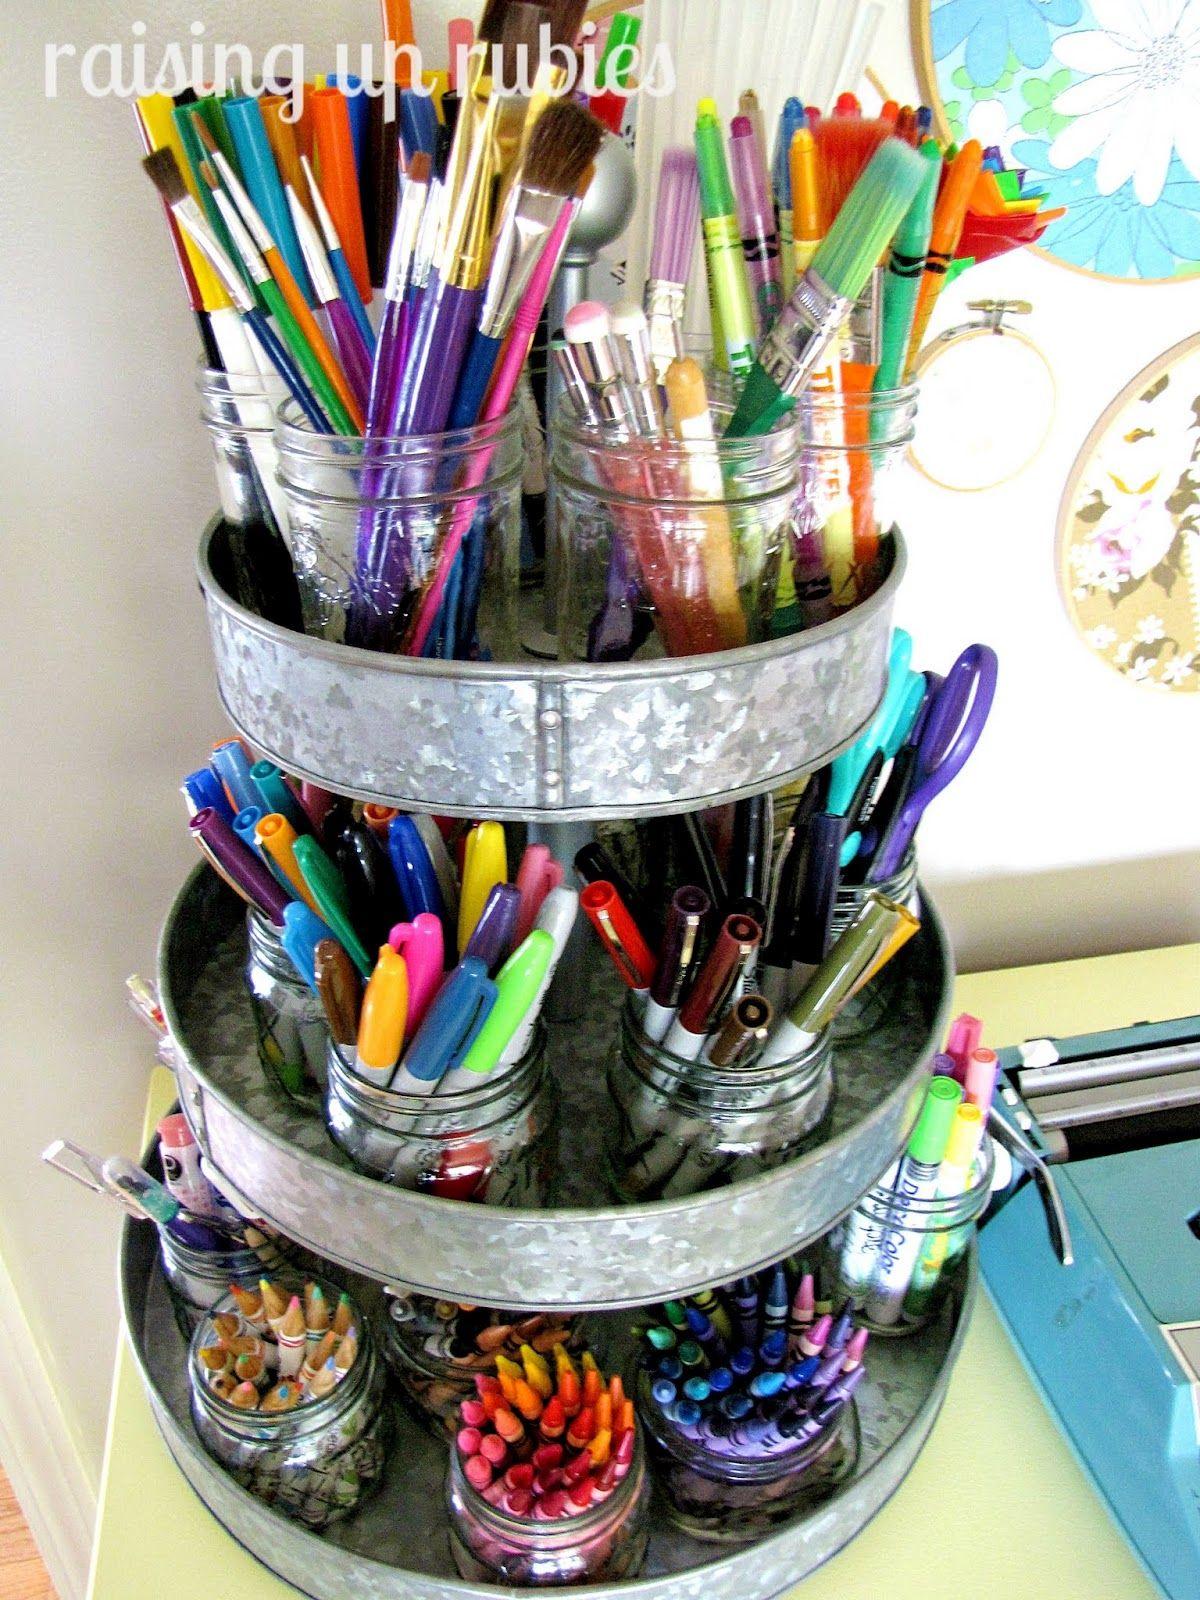 Crafting Markers Pencils Pens Crayons Scissors Etc